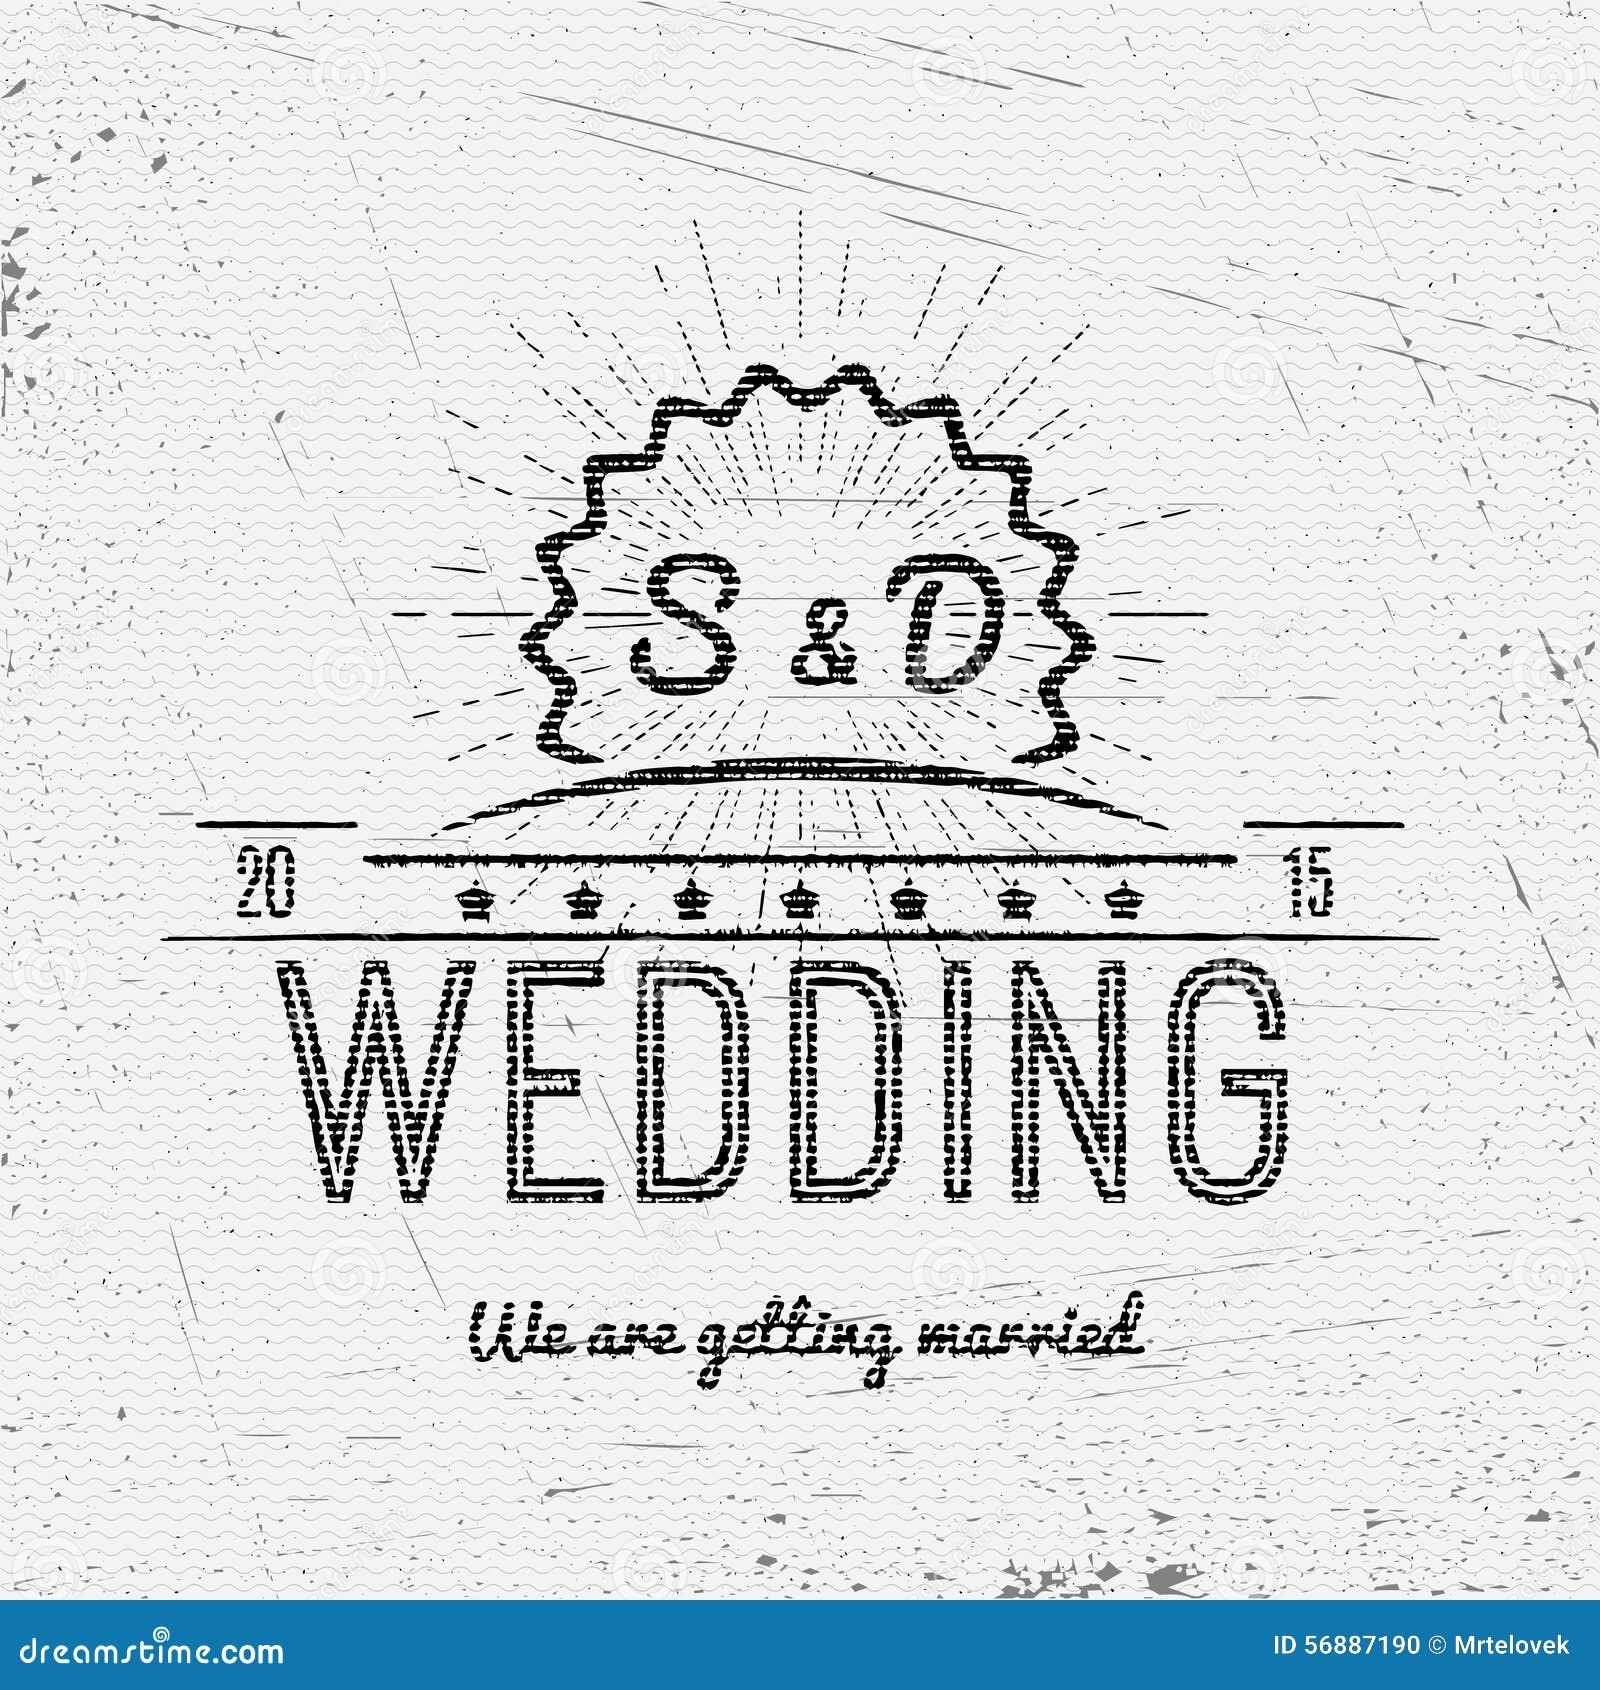 Le nozze badges le carte e le etichette per c è ne uso